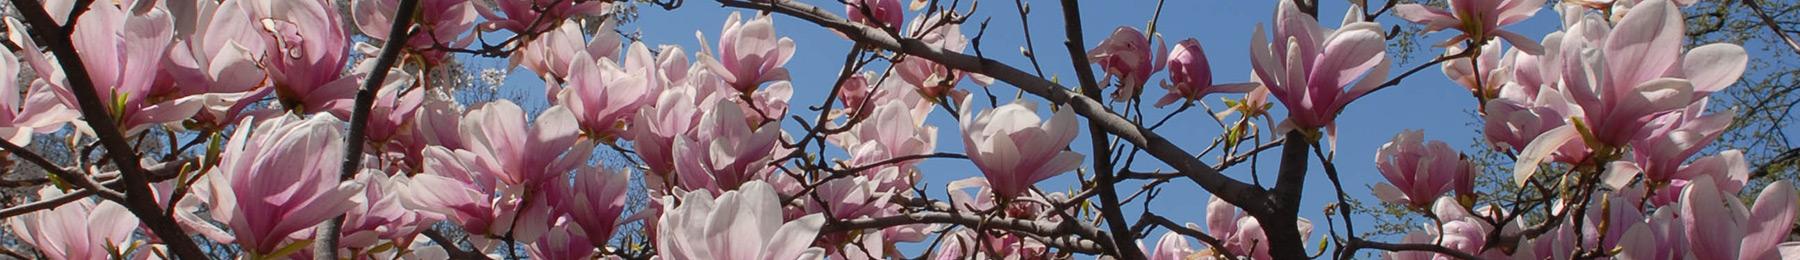 magnolias-central-park